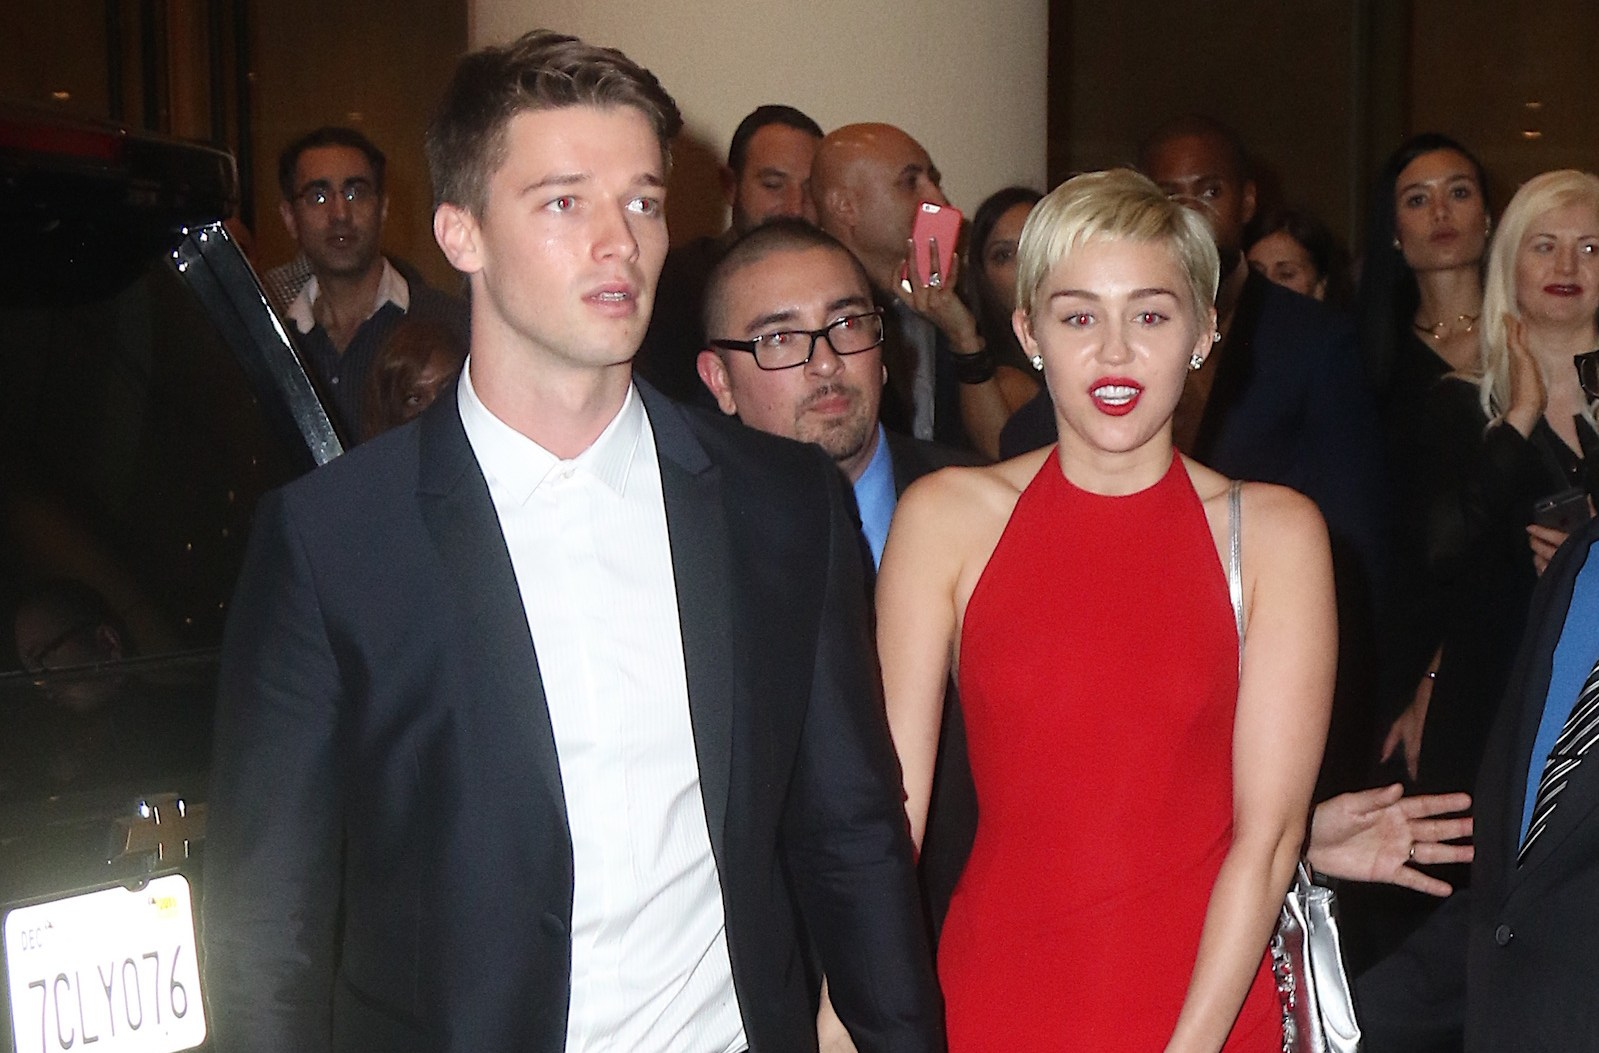 Miley Cyrus, Patrick Schwarzenegger Dating